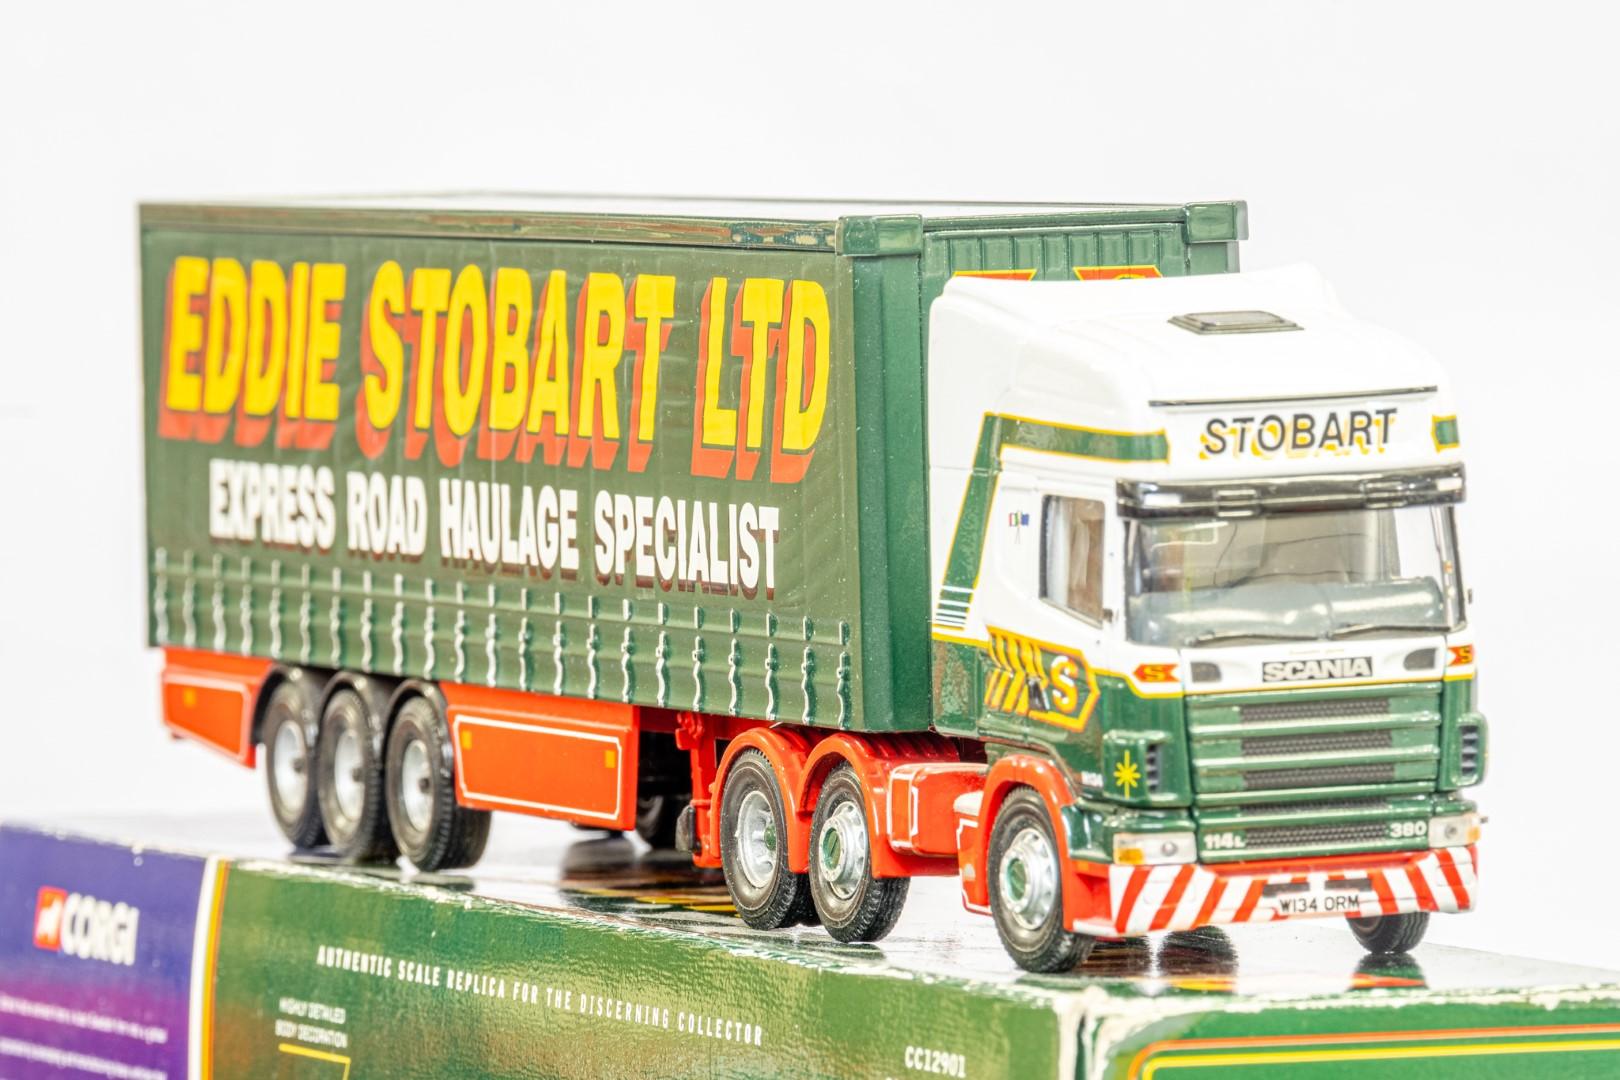 Corgi Scania Topline Curtainside Trailer - Eddie Stobart - Image 7 of 7